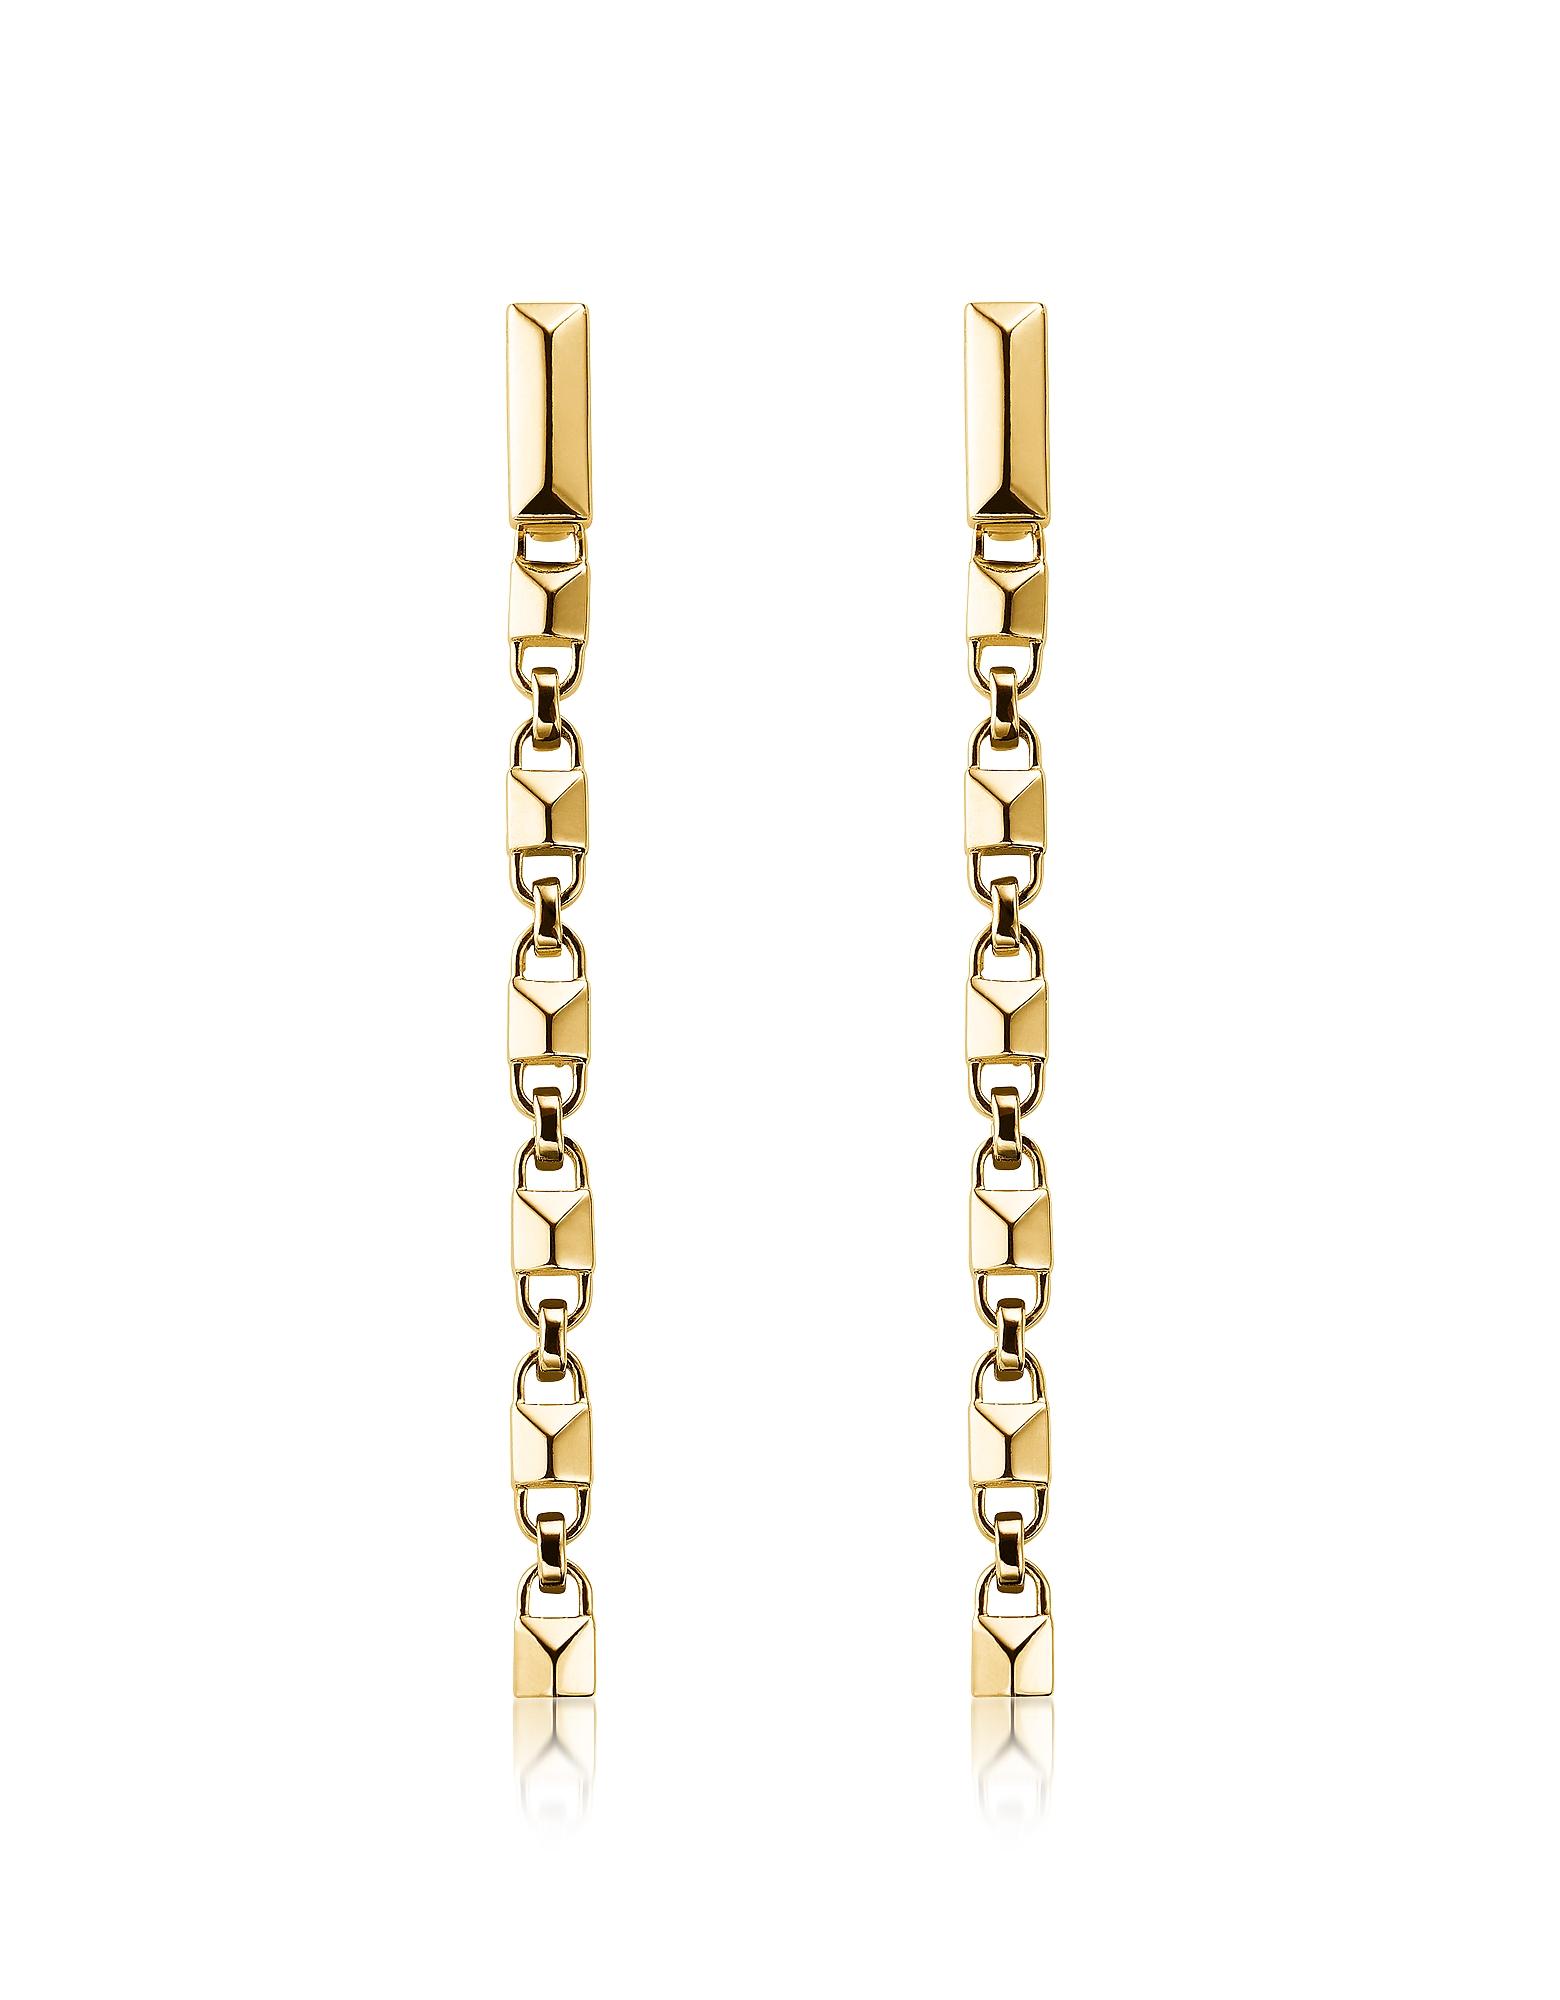 Mercer Link 14K Gold Plated Sterling Silver Linear Earrings